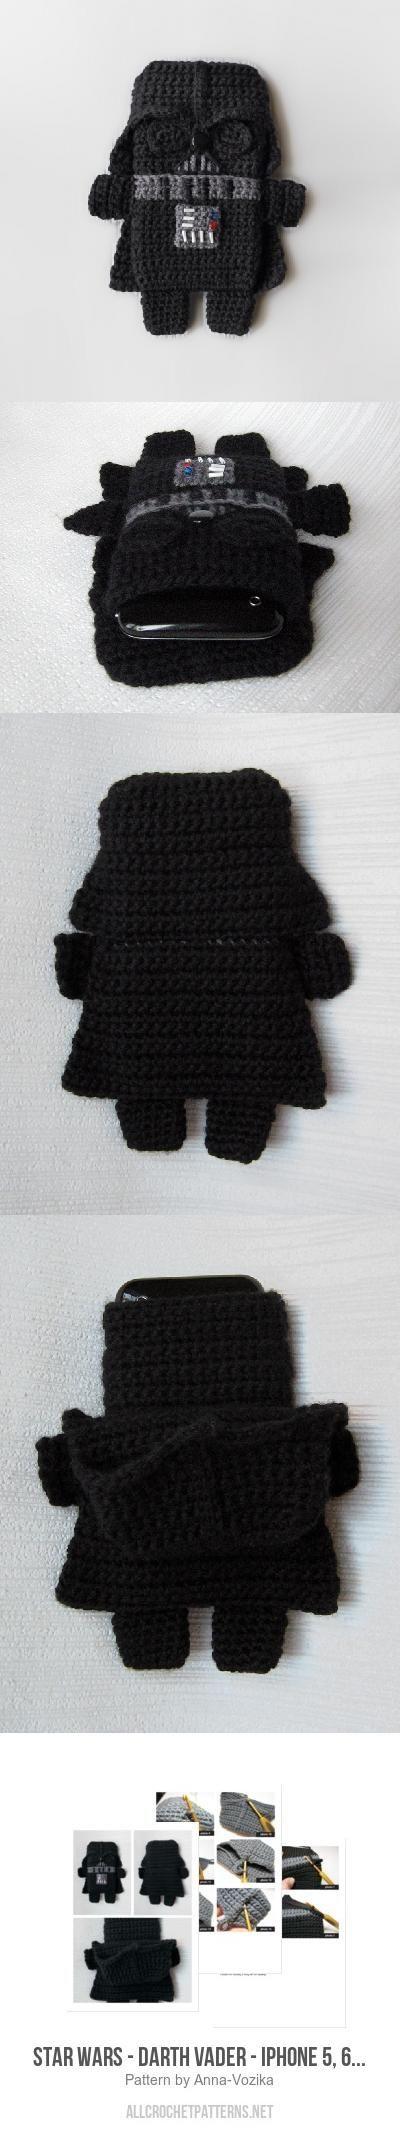 Star Wars Darth Vader Iphone 5 6 7 Case Crochet Pattern